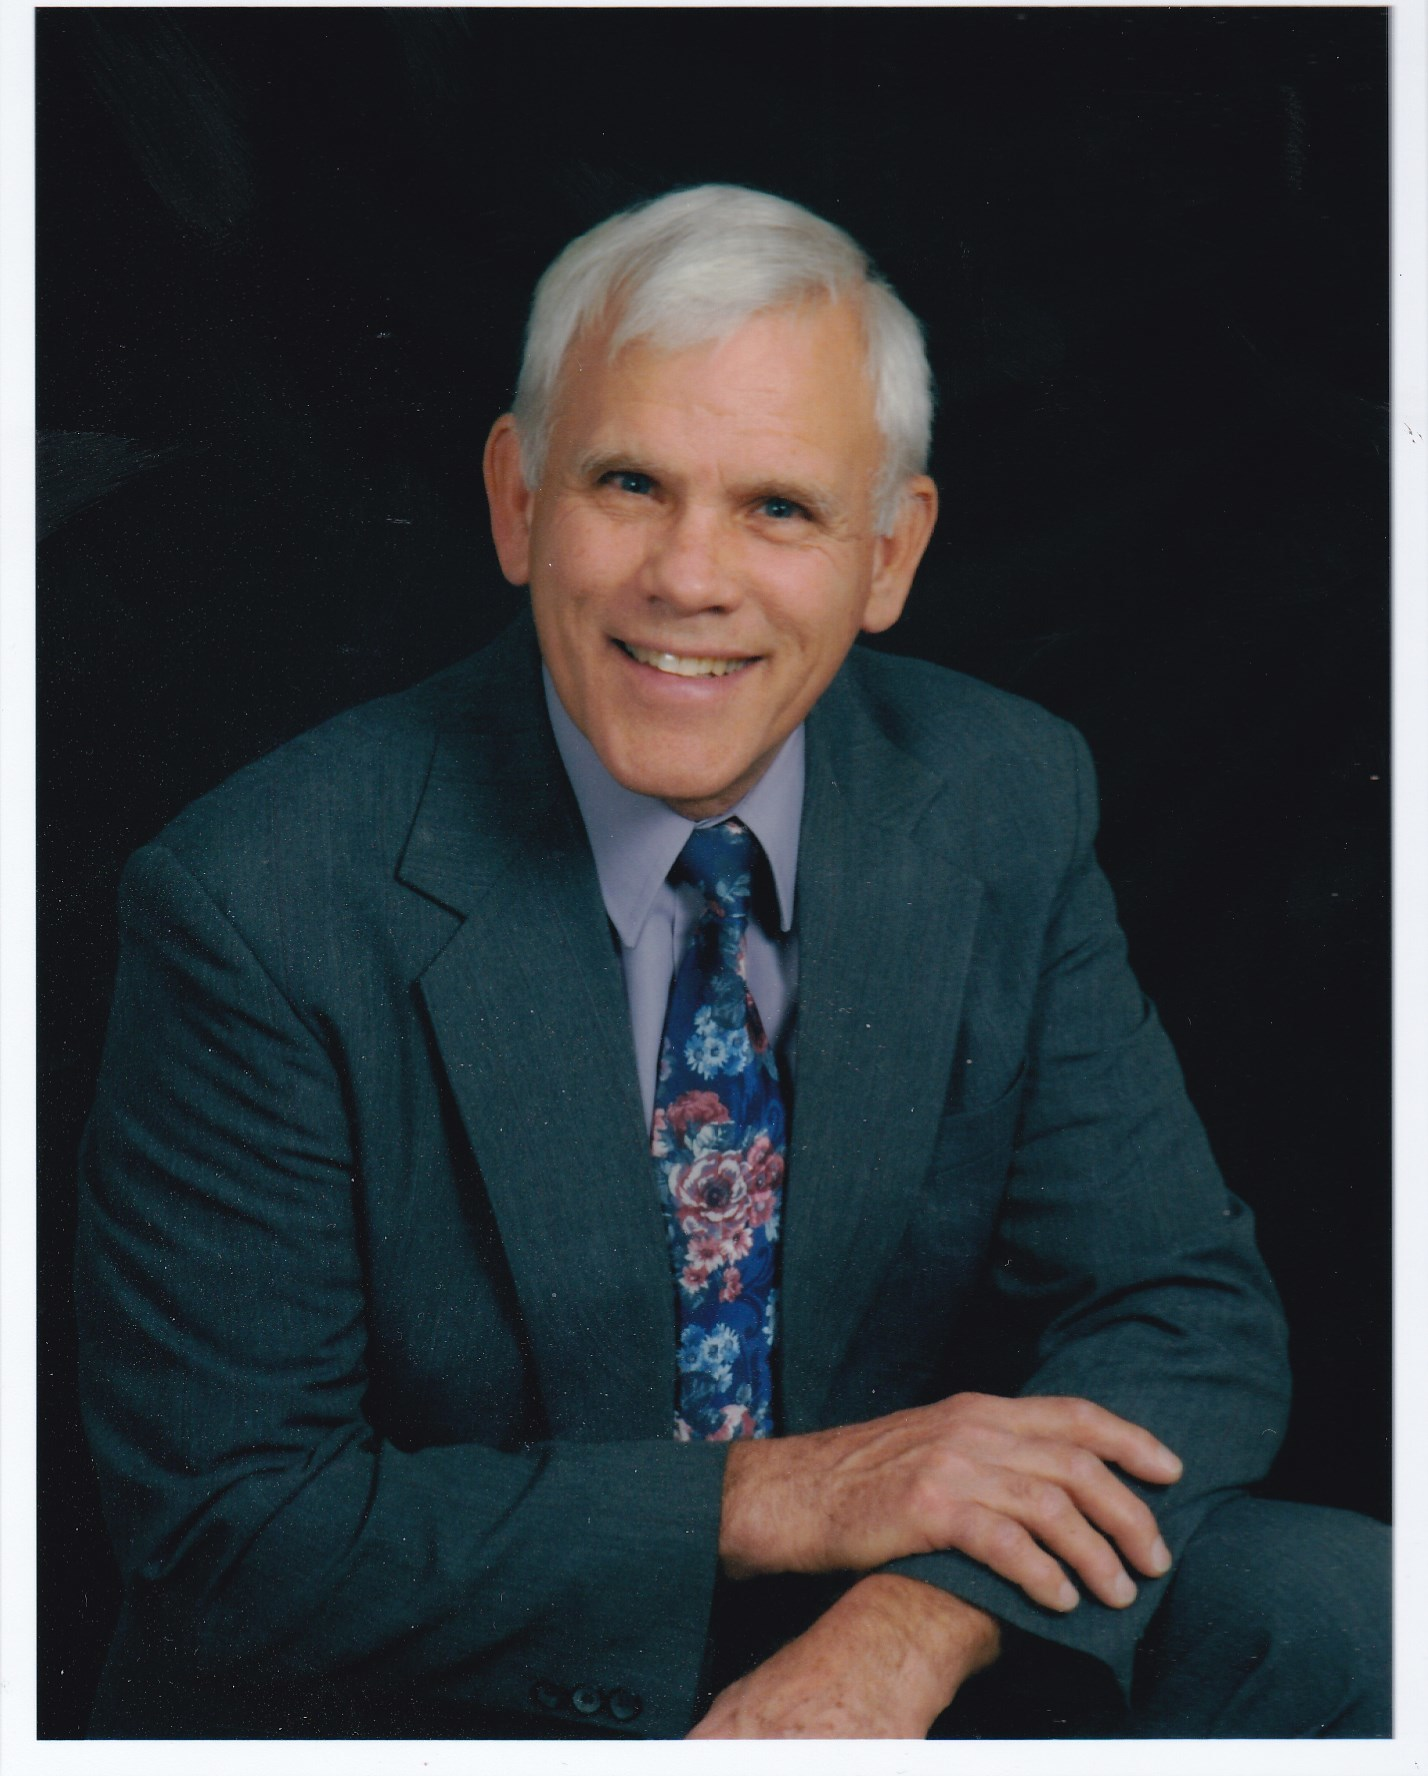 Duane Eugene Ahrens